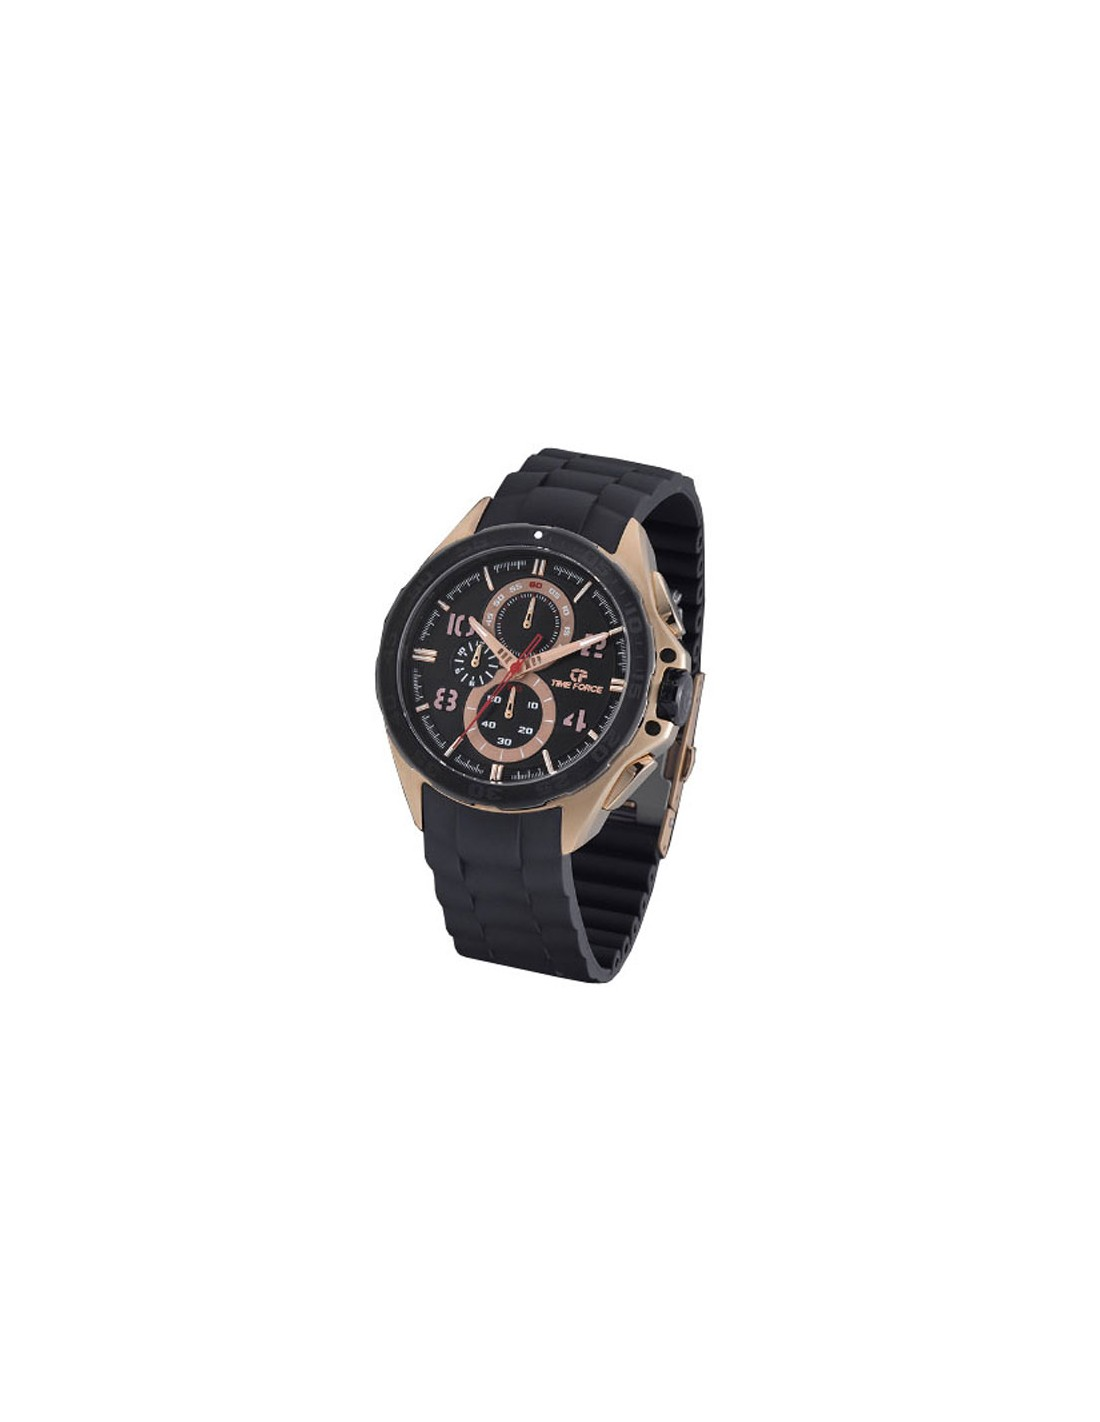 b8c5610244f4 Reloj Time Force TF3328M15 - Relojes Time Force